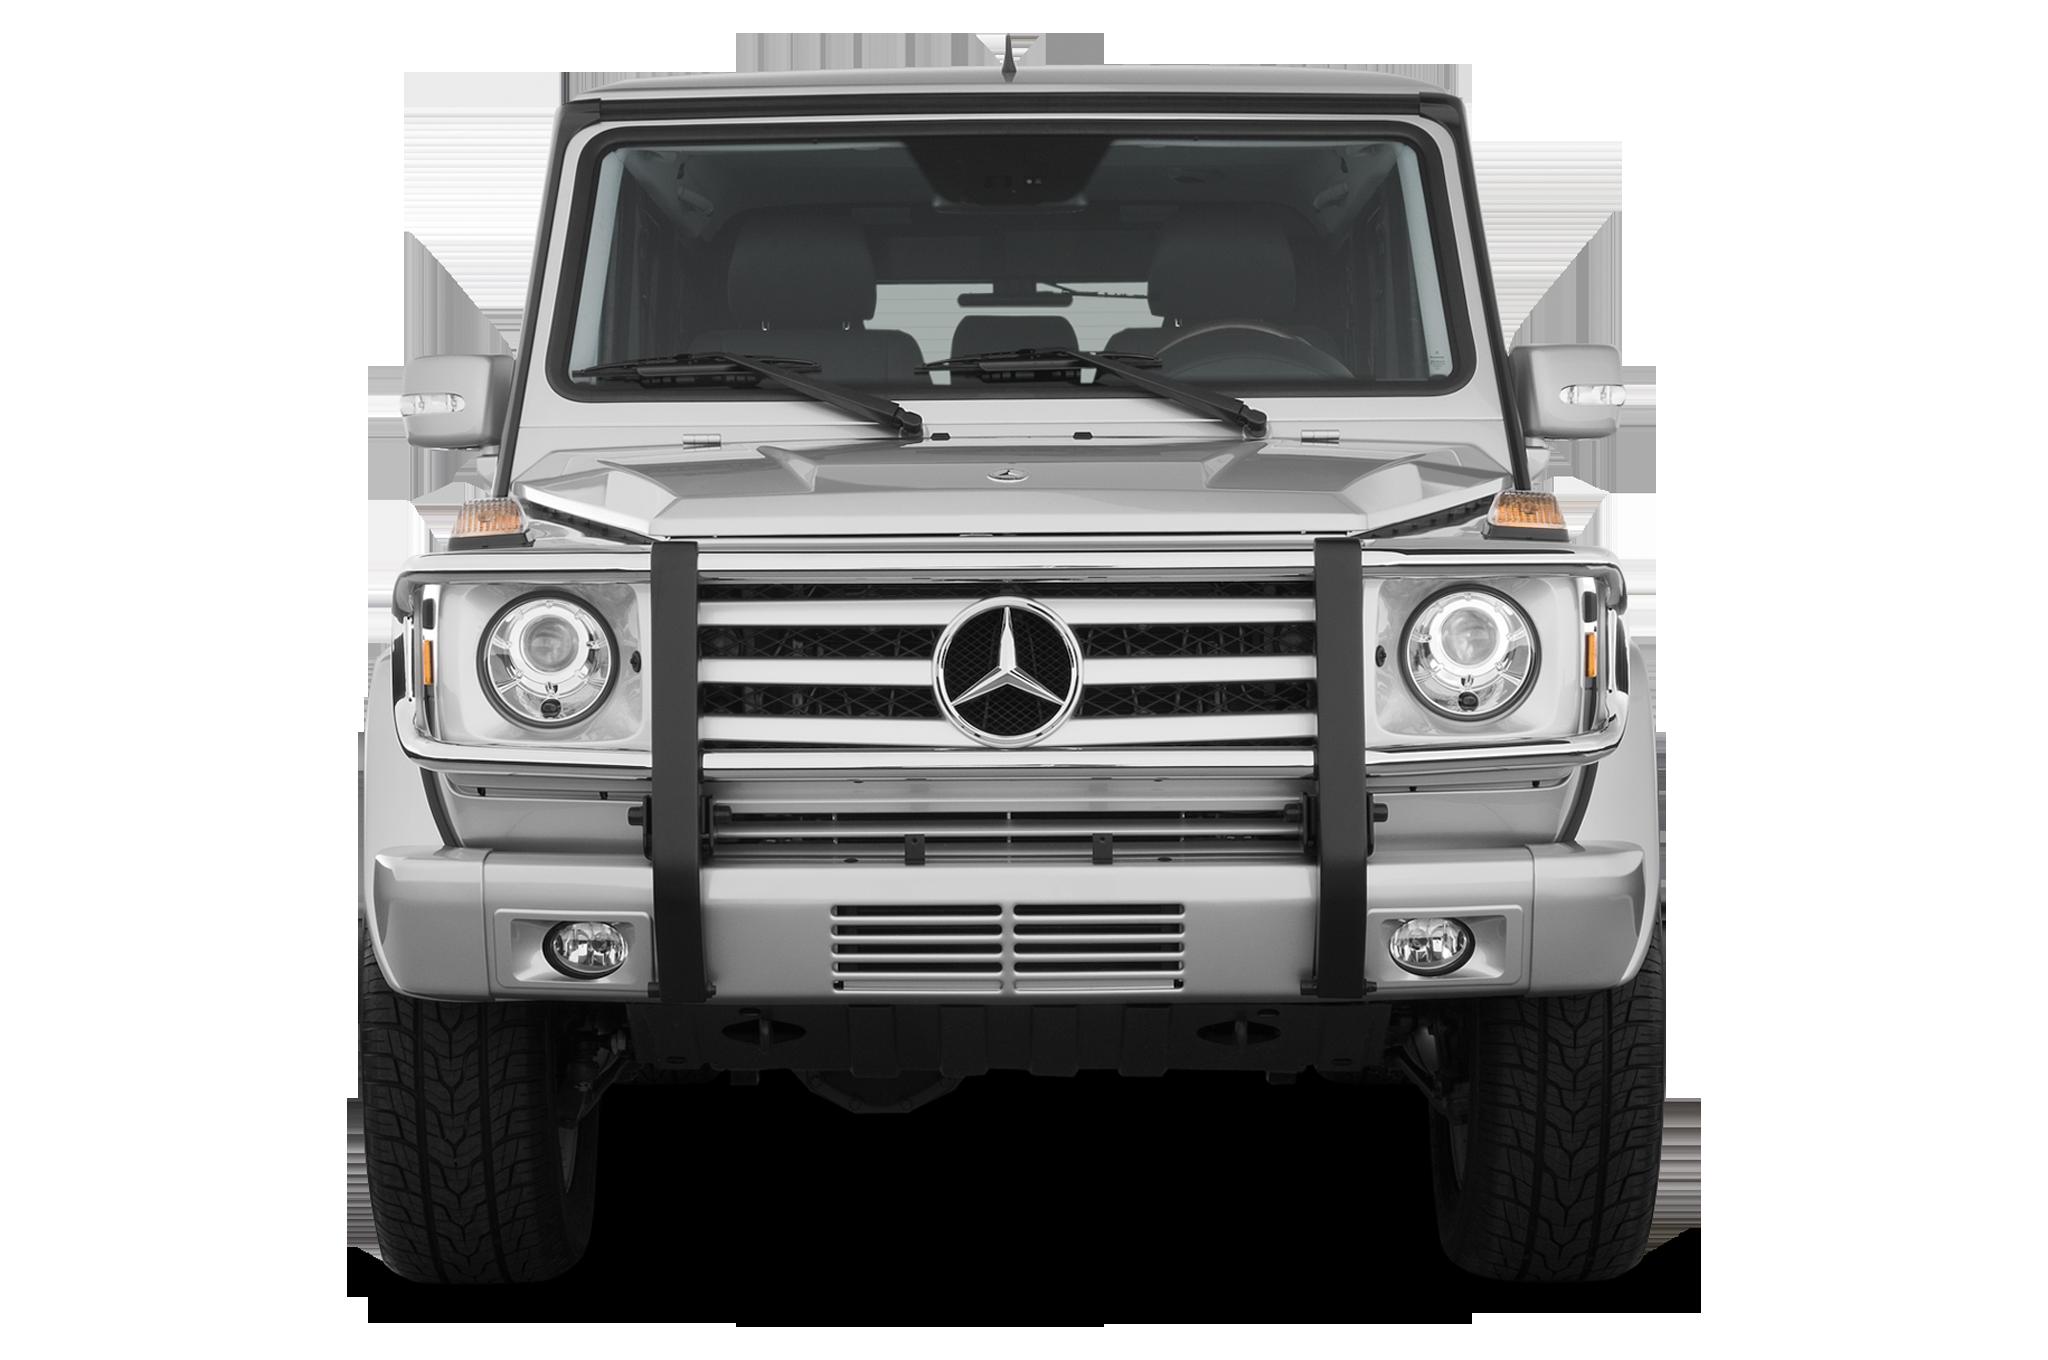 Mercedes-Benz G-klasse II (W463) Restyling 3 2012 - 2015 SUV #5